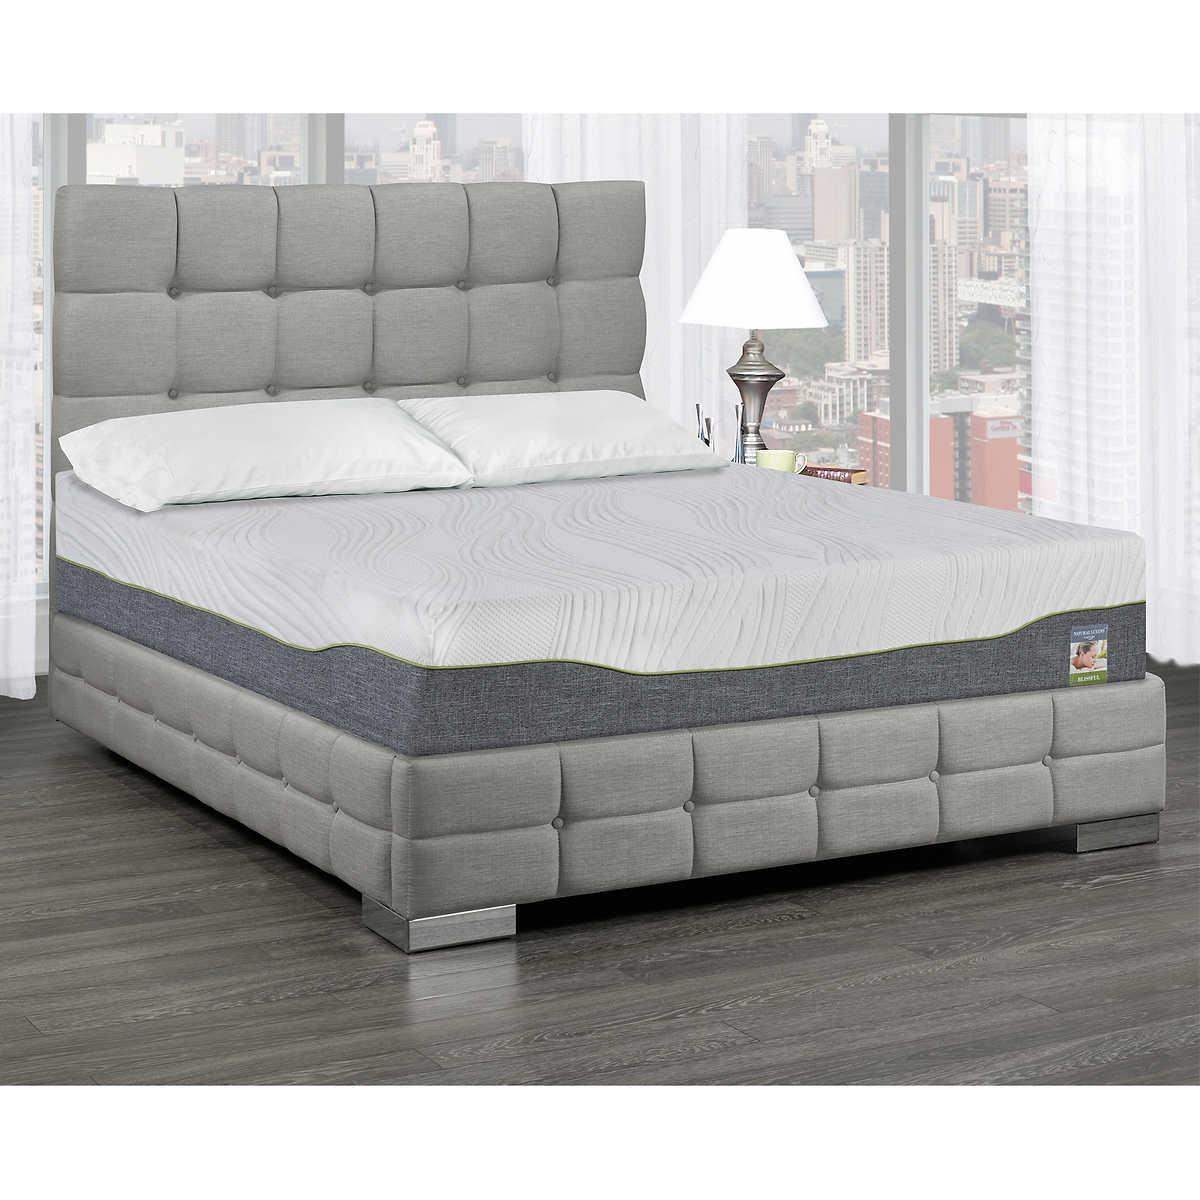 Springwall® Natural Luxury Blissful King Mattress